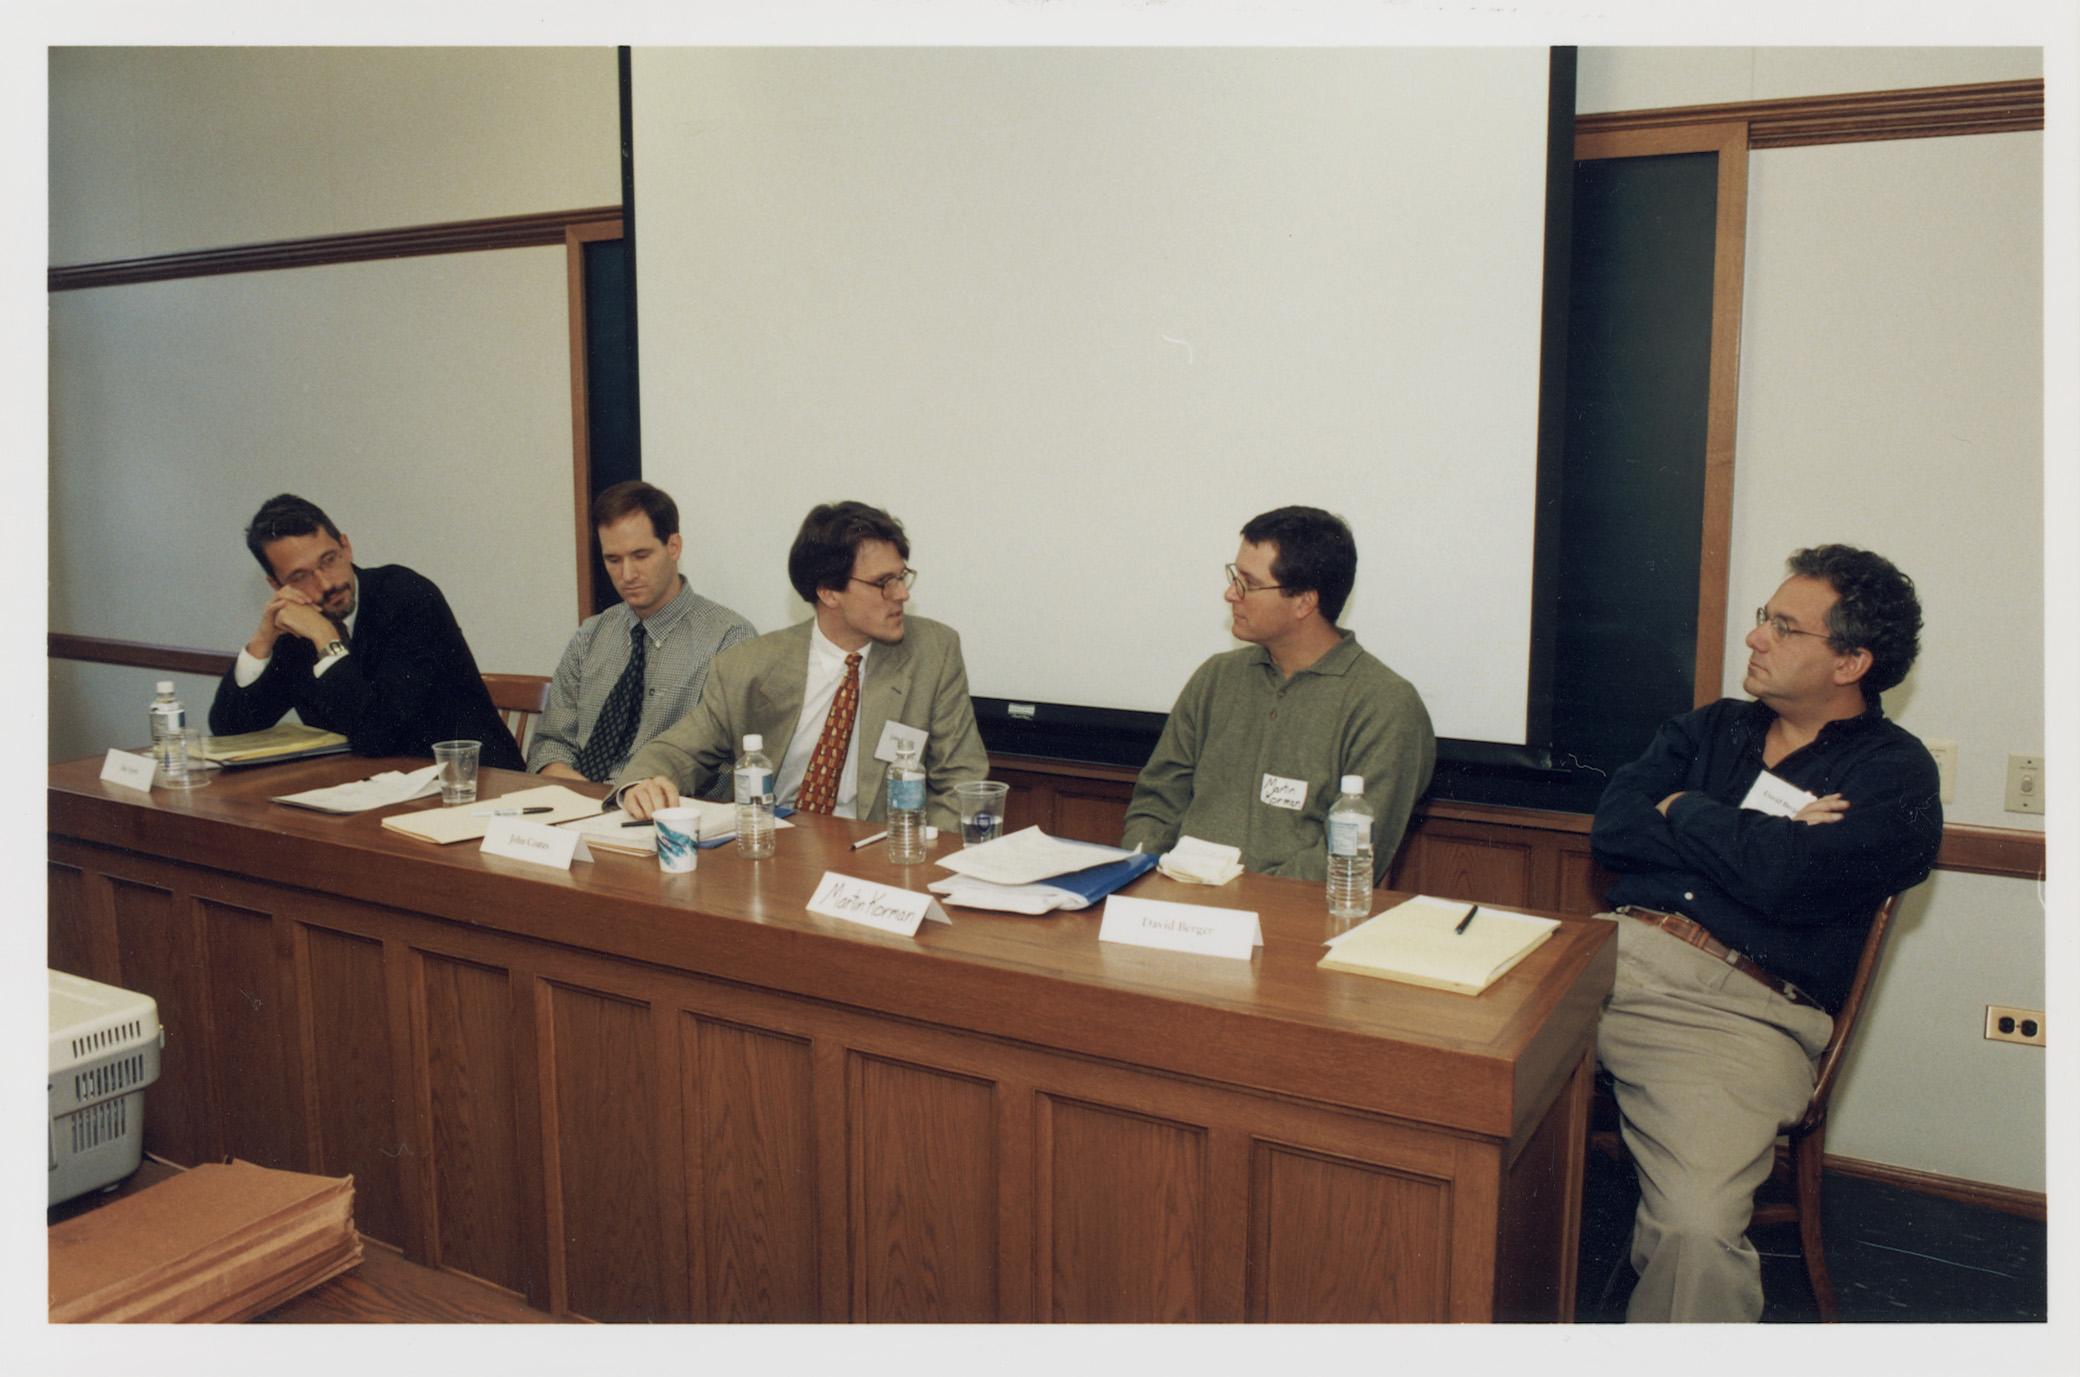 YLS Prof. Ian Ayres '86, NYU Law Prof. Robert Daines '92, Harvard Law Prof. John Coates, Martin Korman '89, and David Berger